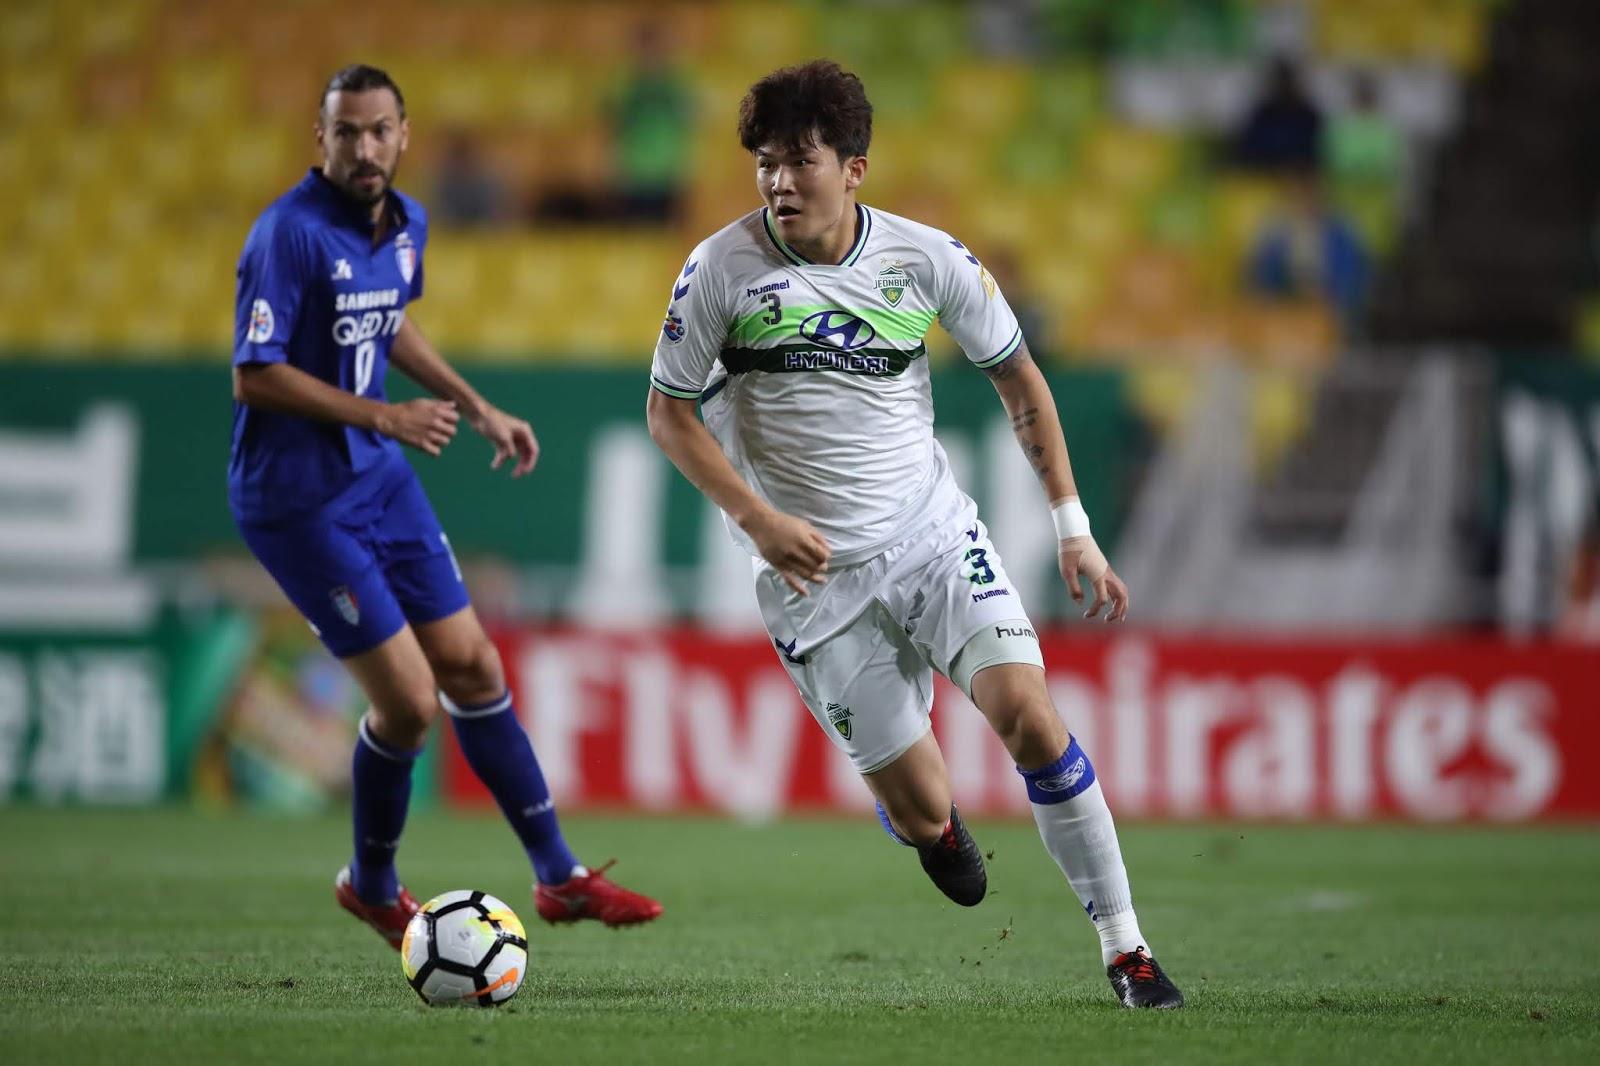 Jeonbuk Hyundai Motors defender Kim Min-jae signs for English Premier League side Watford FC